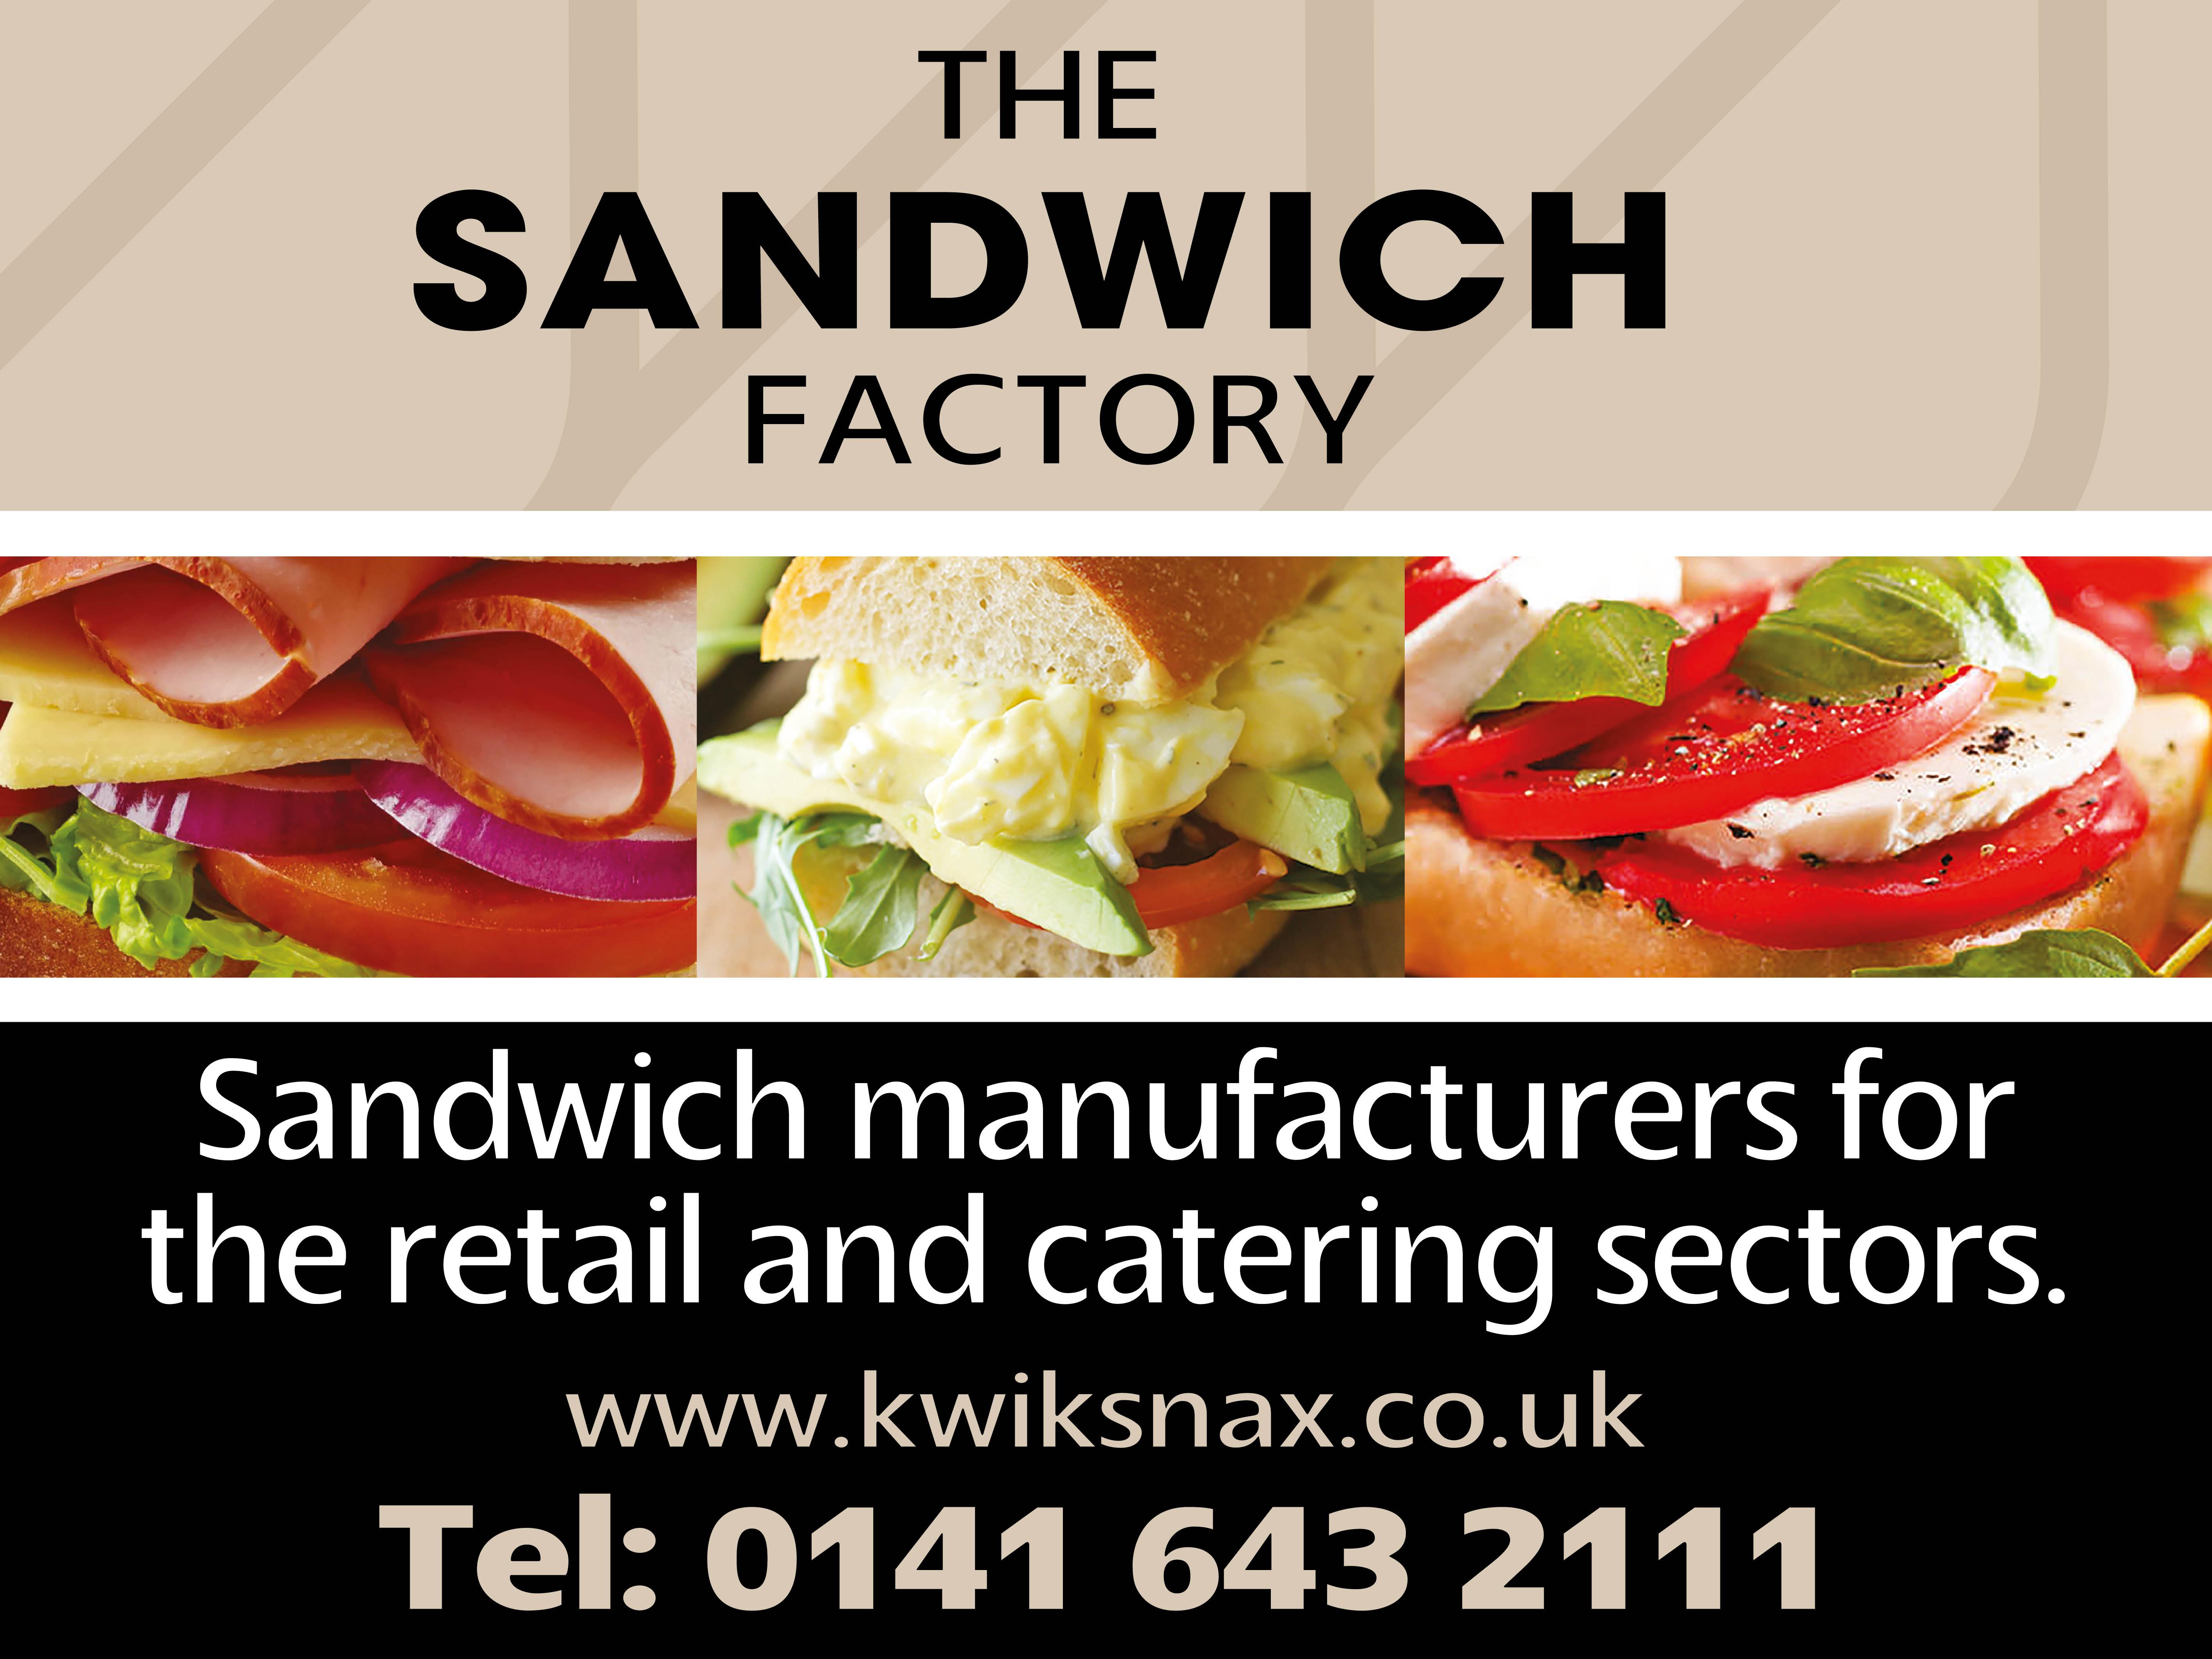 The Sandwich Factory